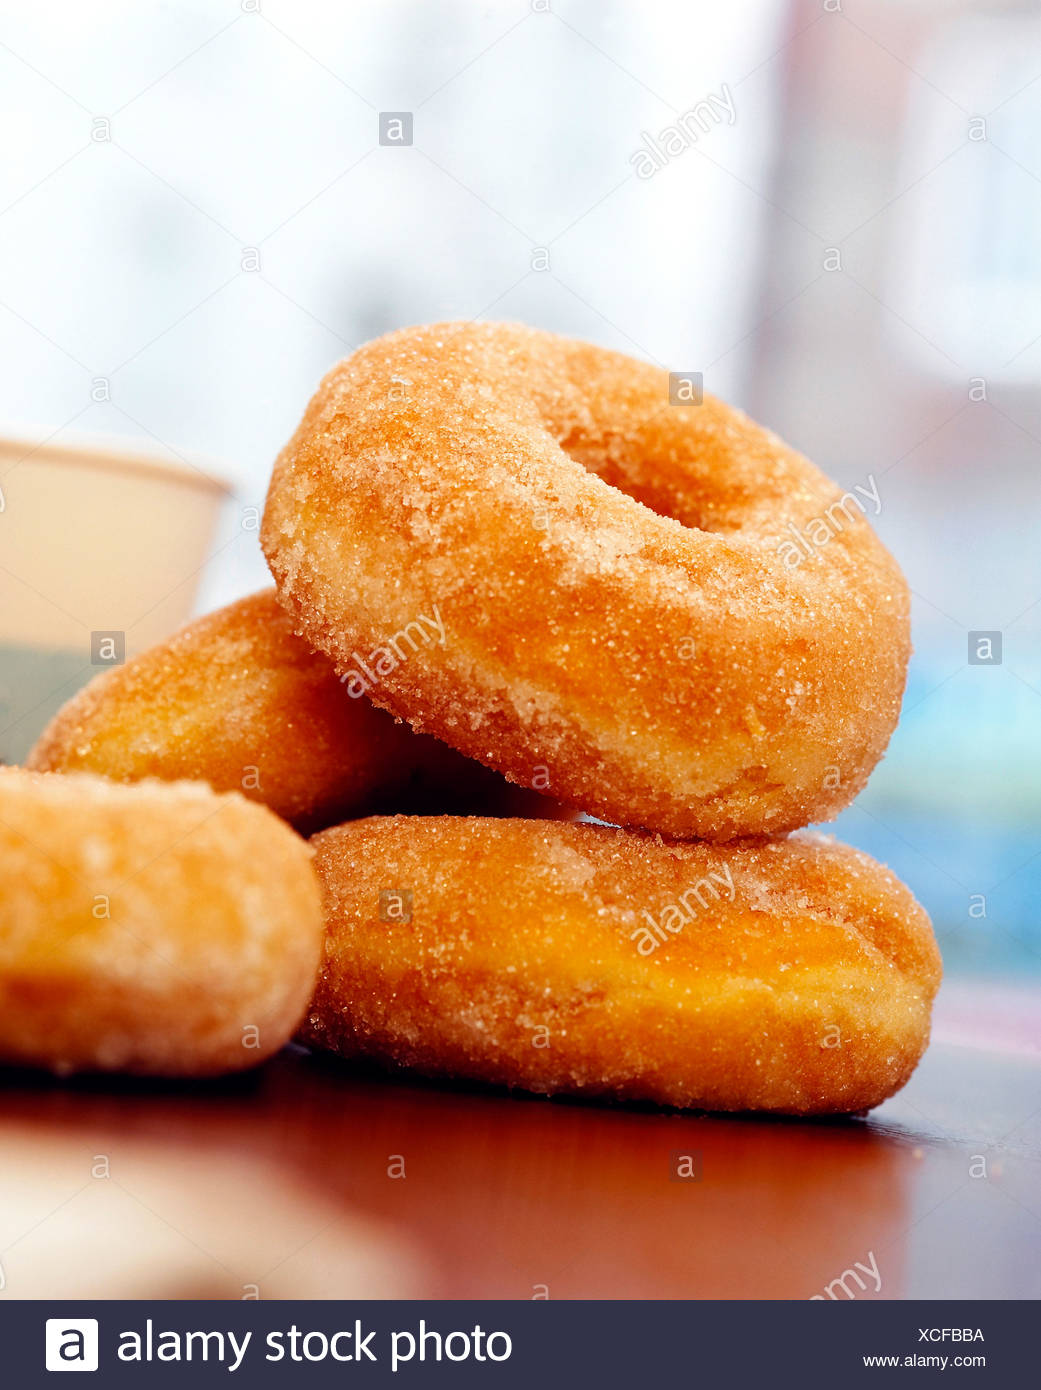 Donuts, close-up - Stock Image